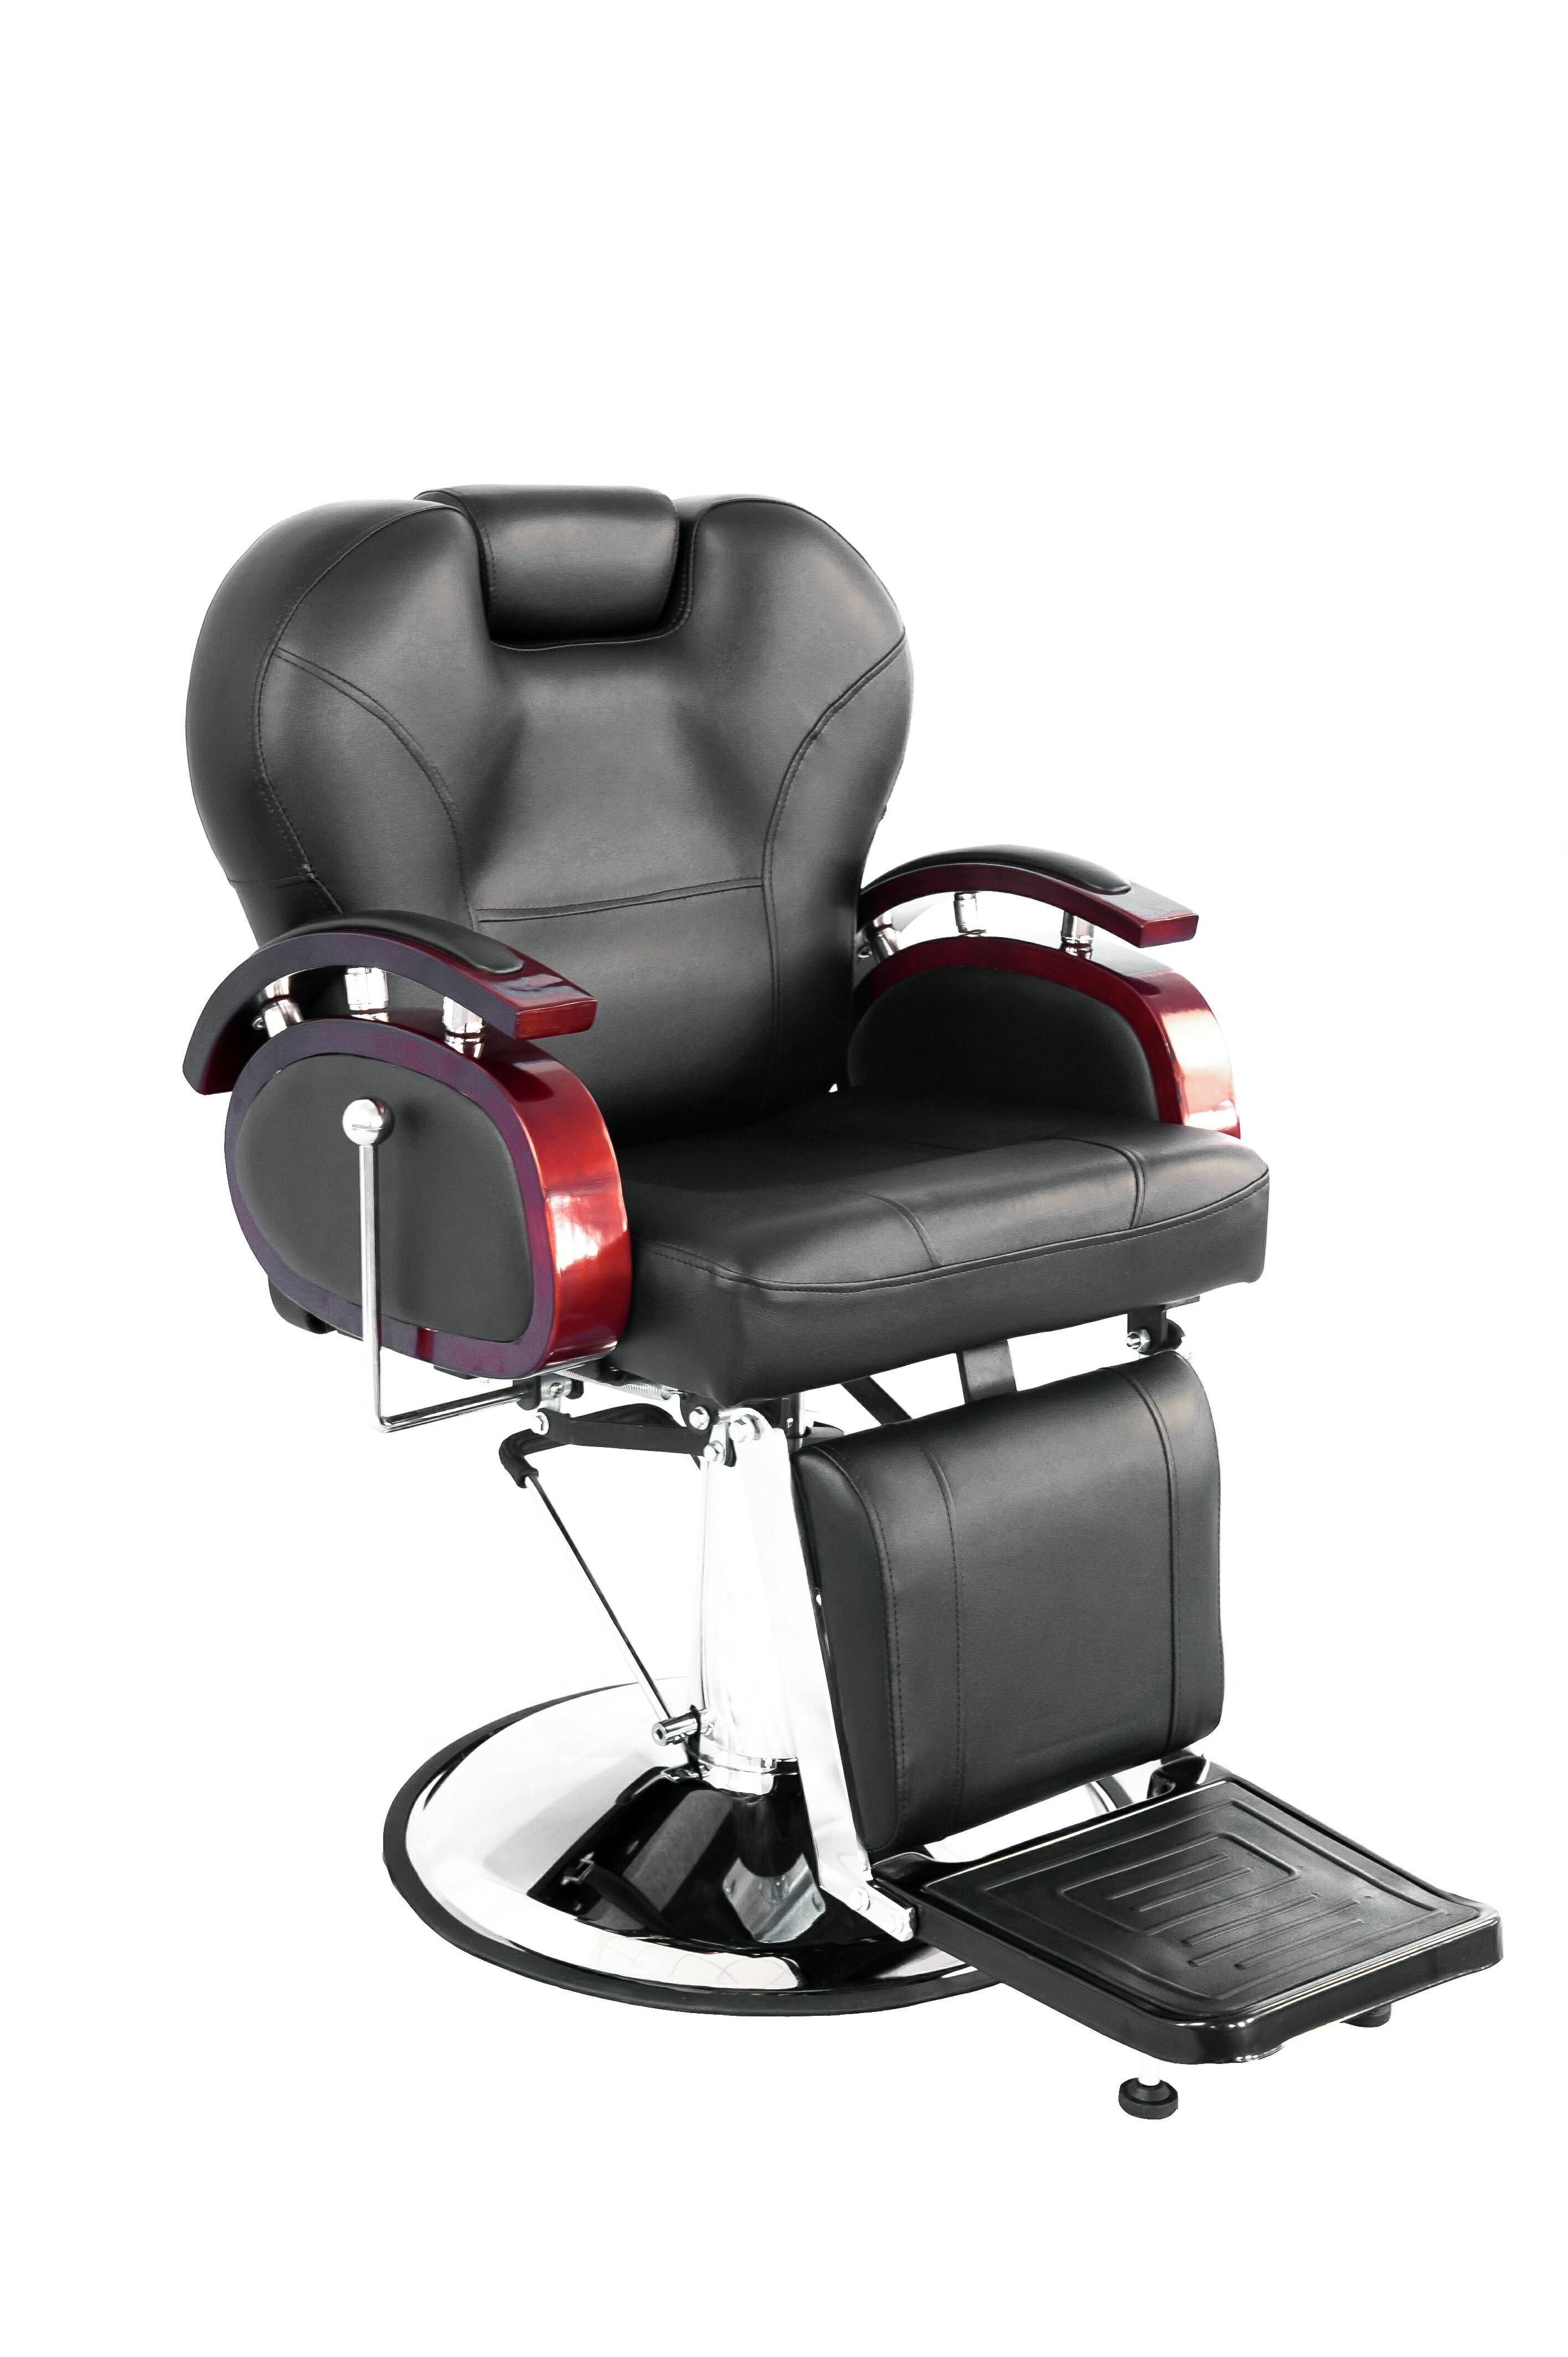 BarberPub All Purpose Hydraulic Recline Barber Chair Salon Beauty Spa  Shampoo Equipment 8705 0